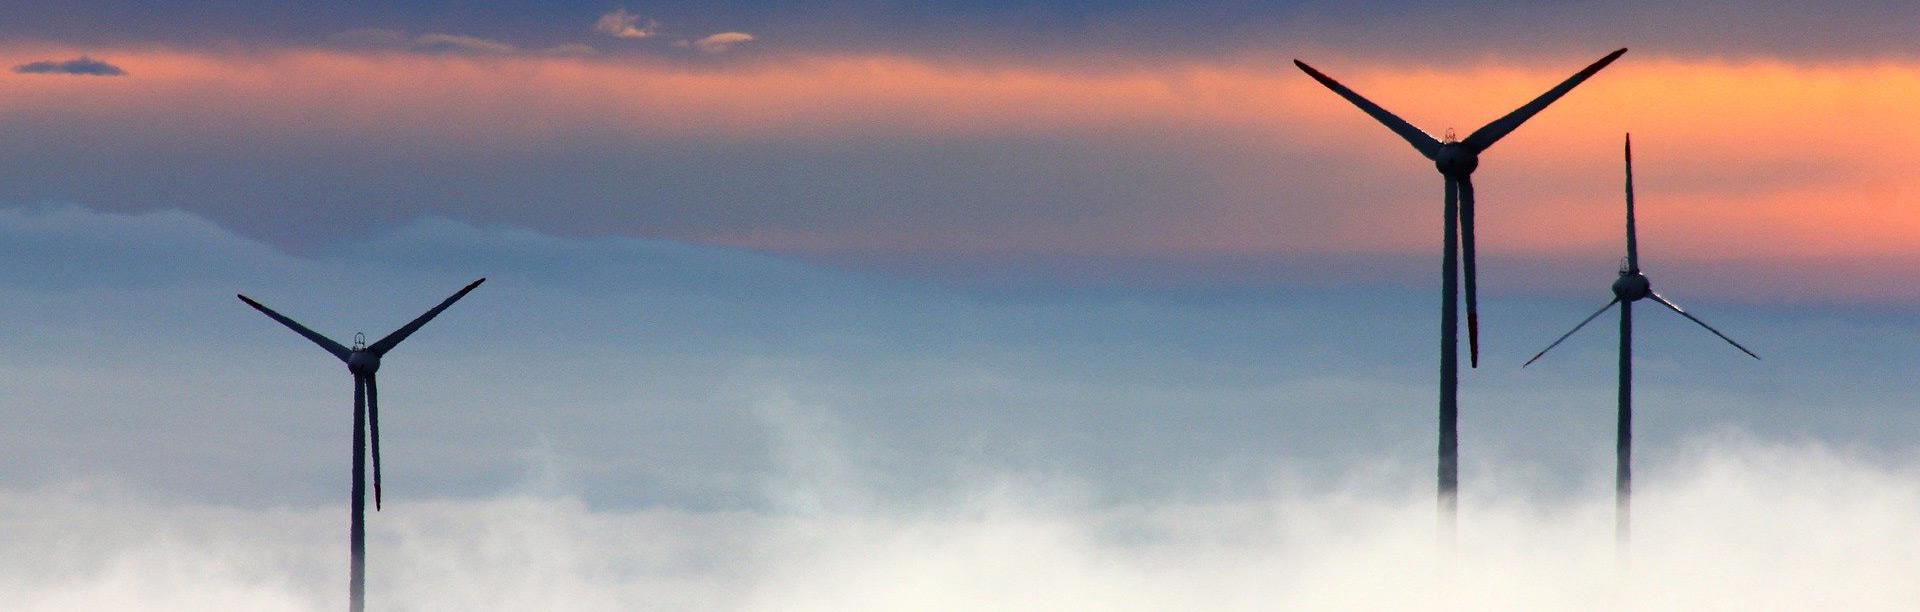 banner allg windraeder nebel